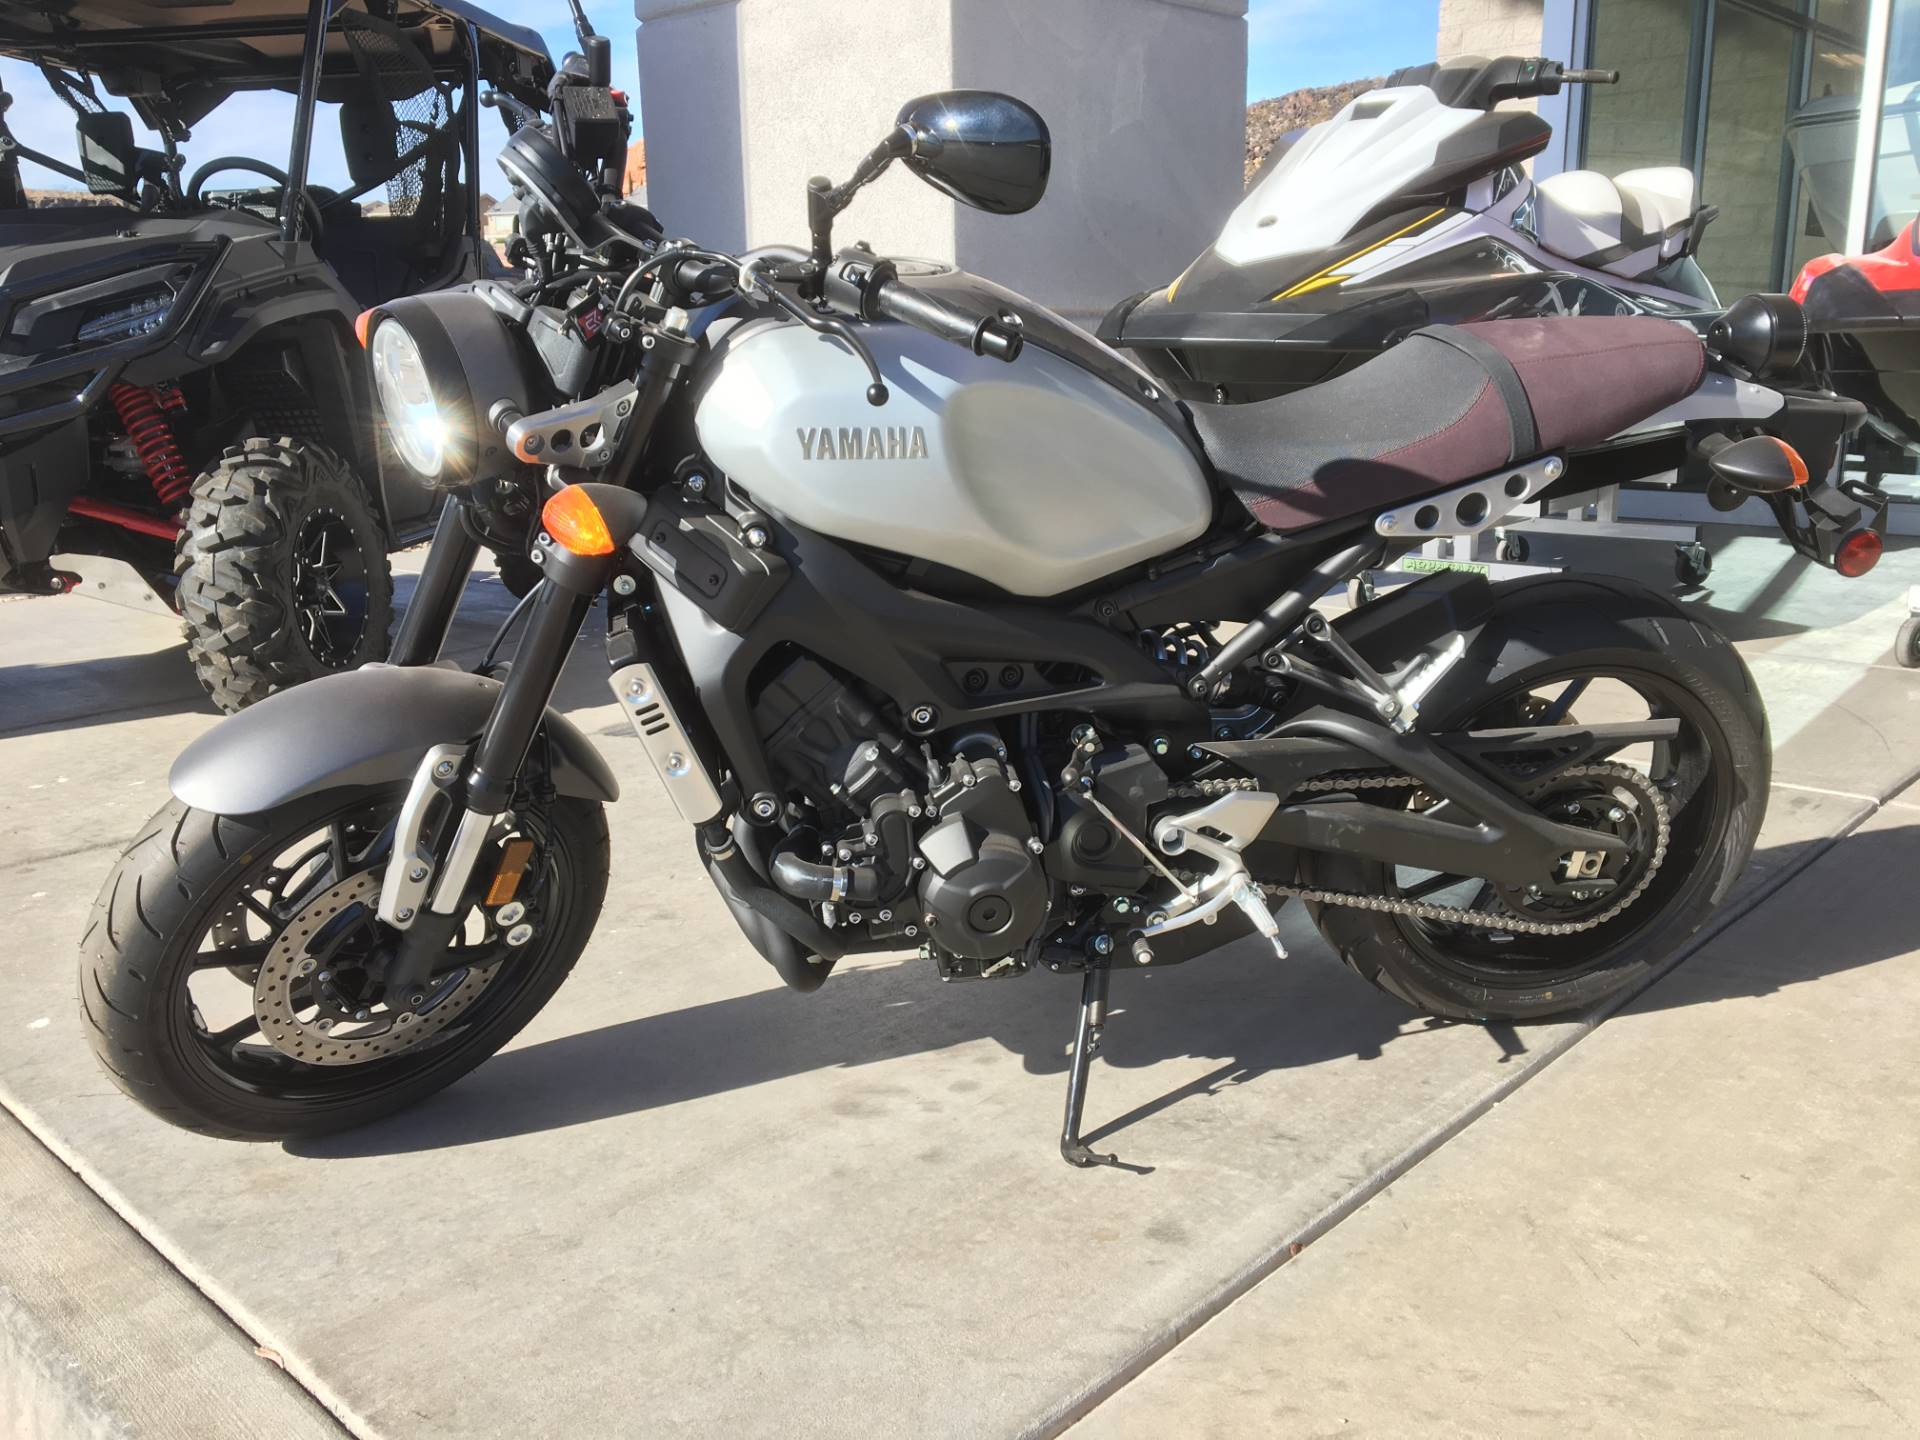 2016 Yamaha XSR900 for sale 133780